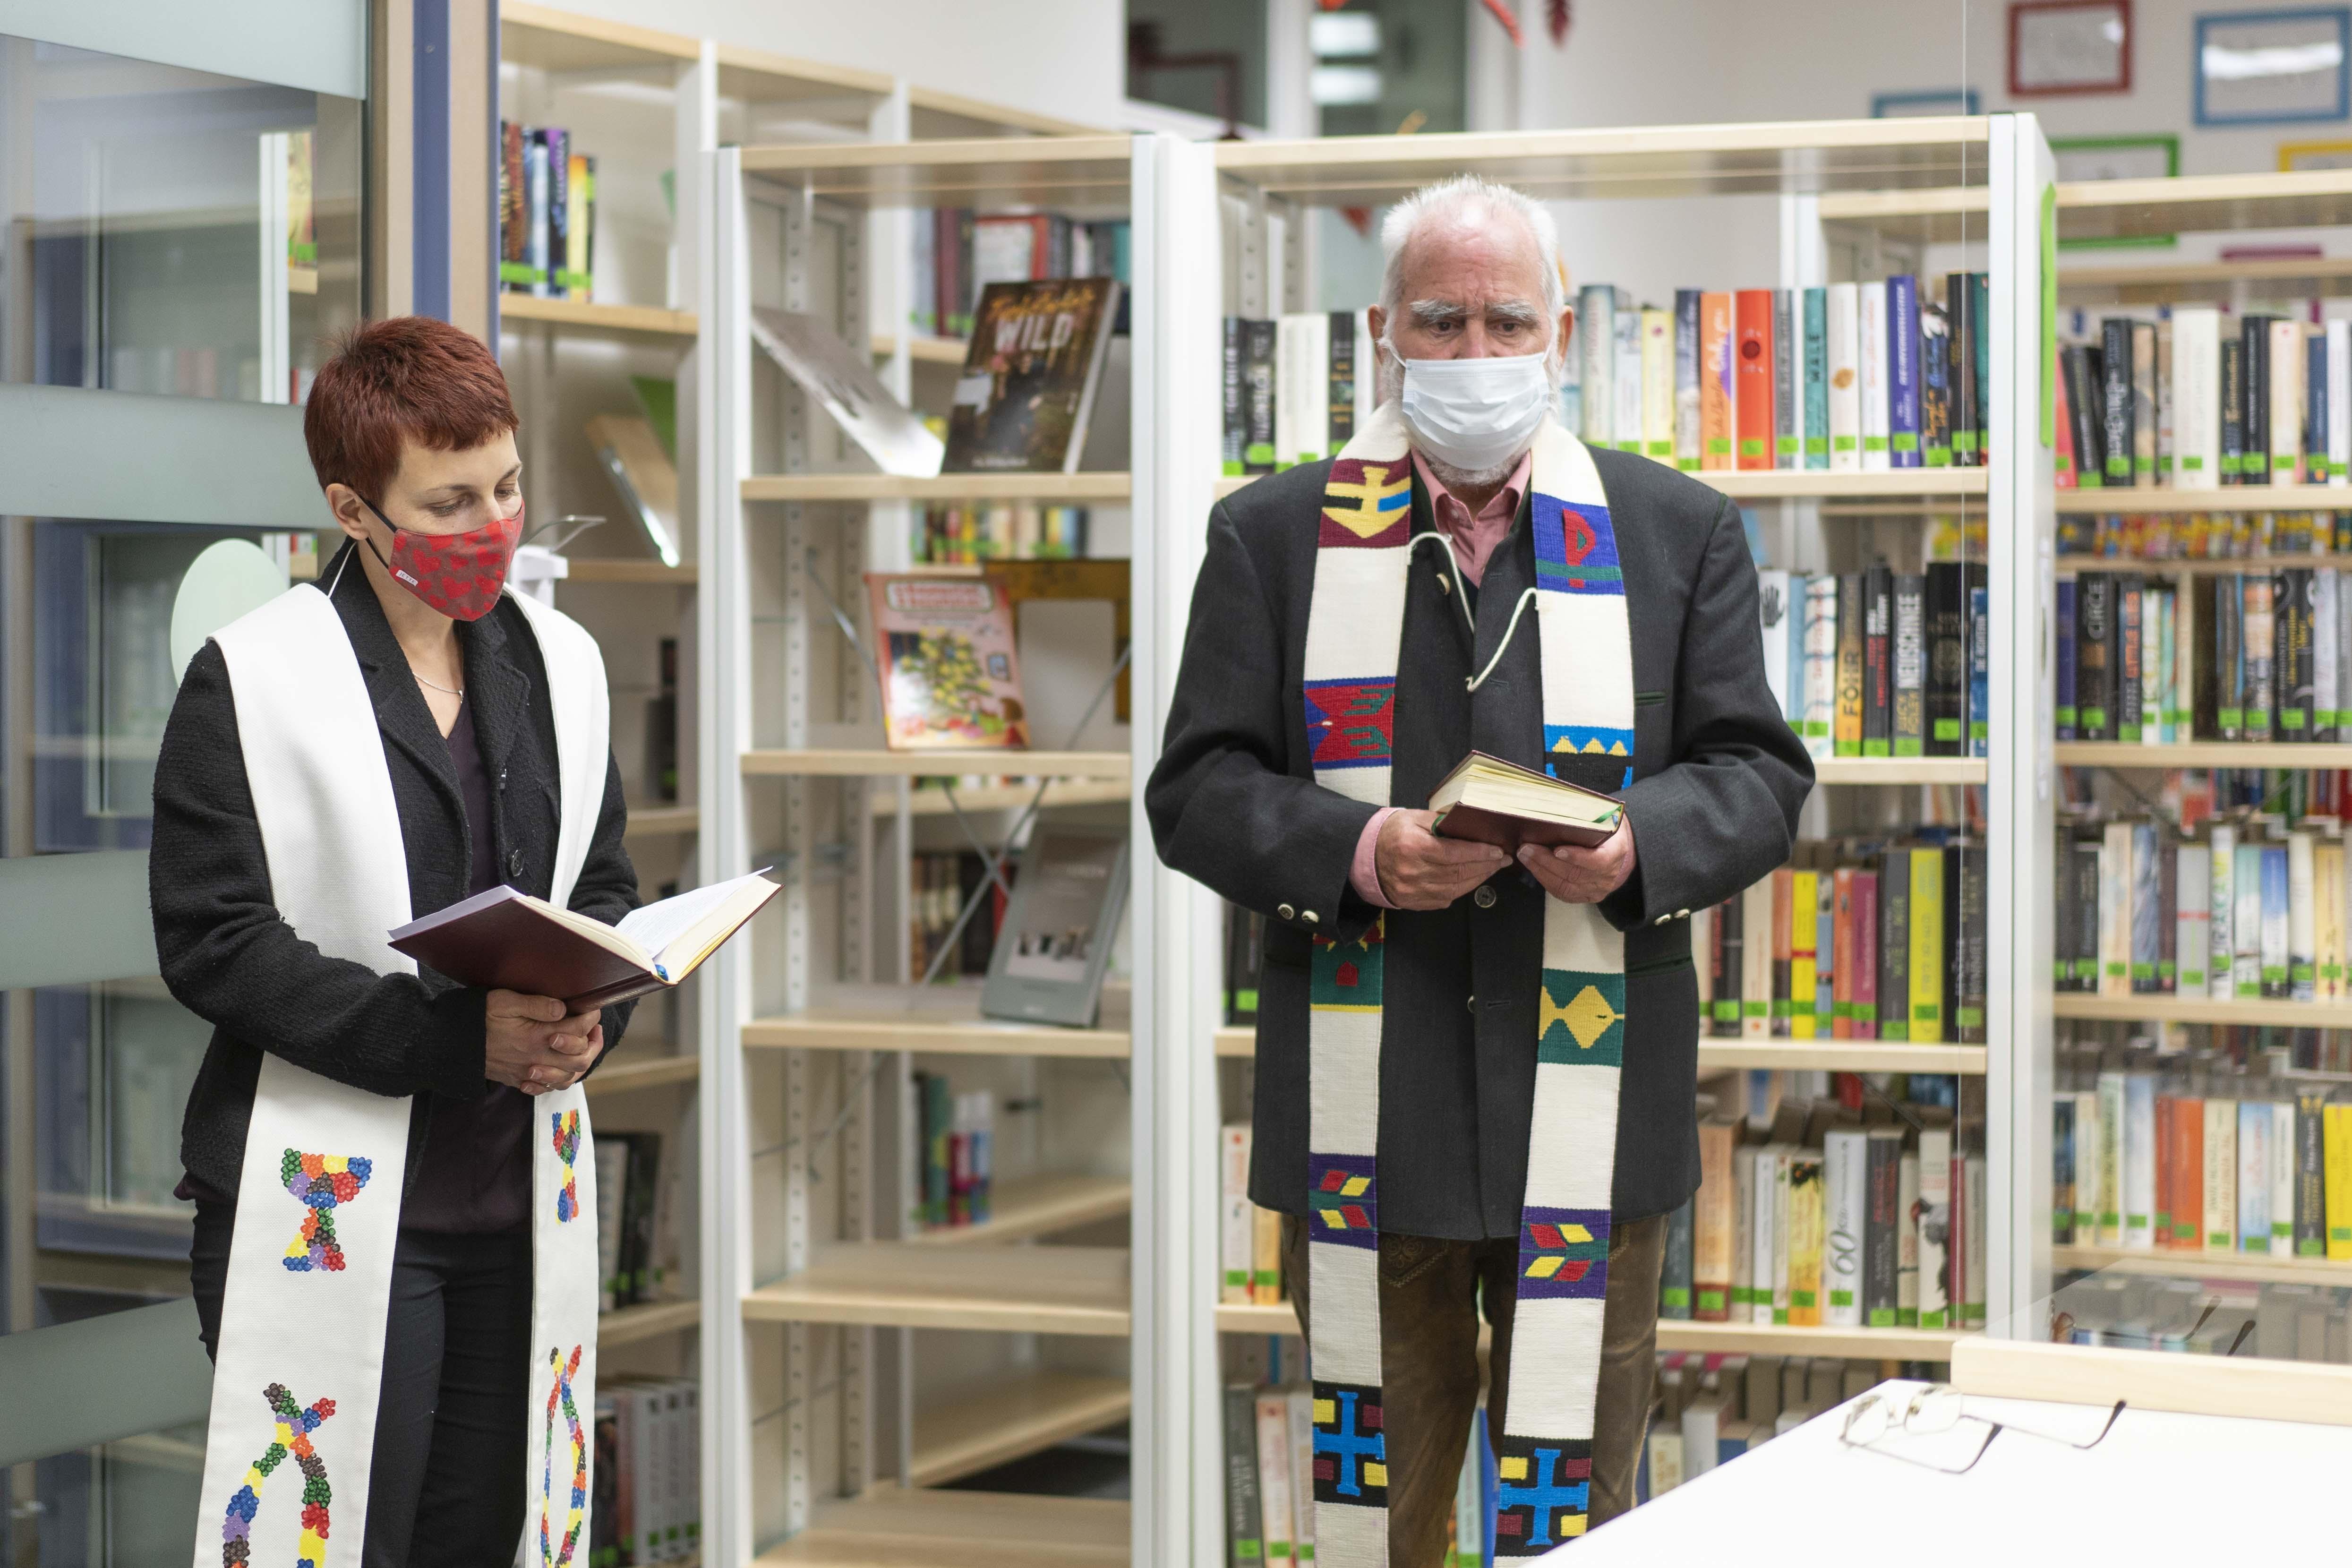 Pfarrerin Barbara Röhm, Pfarrer Helmut Enemoser (Foto: Elisa Hanusch)